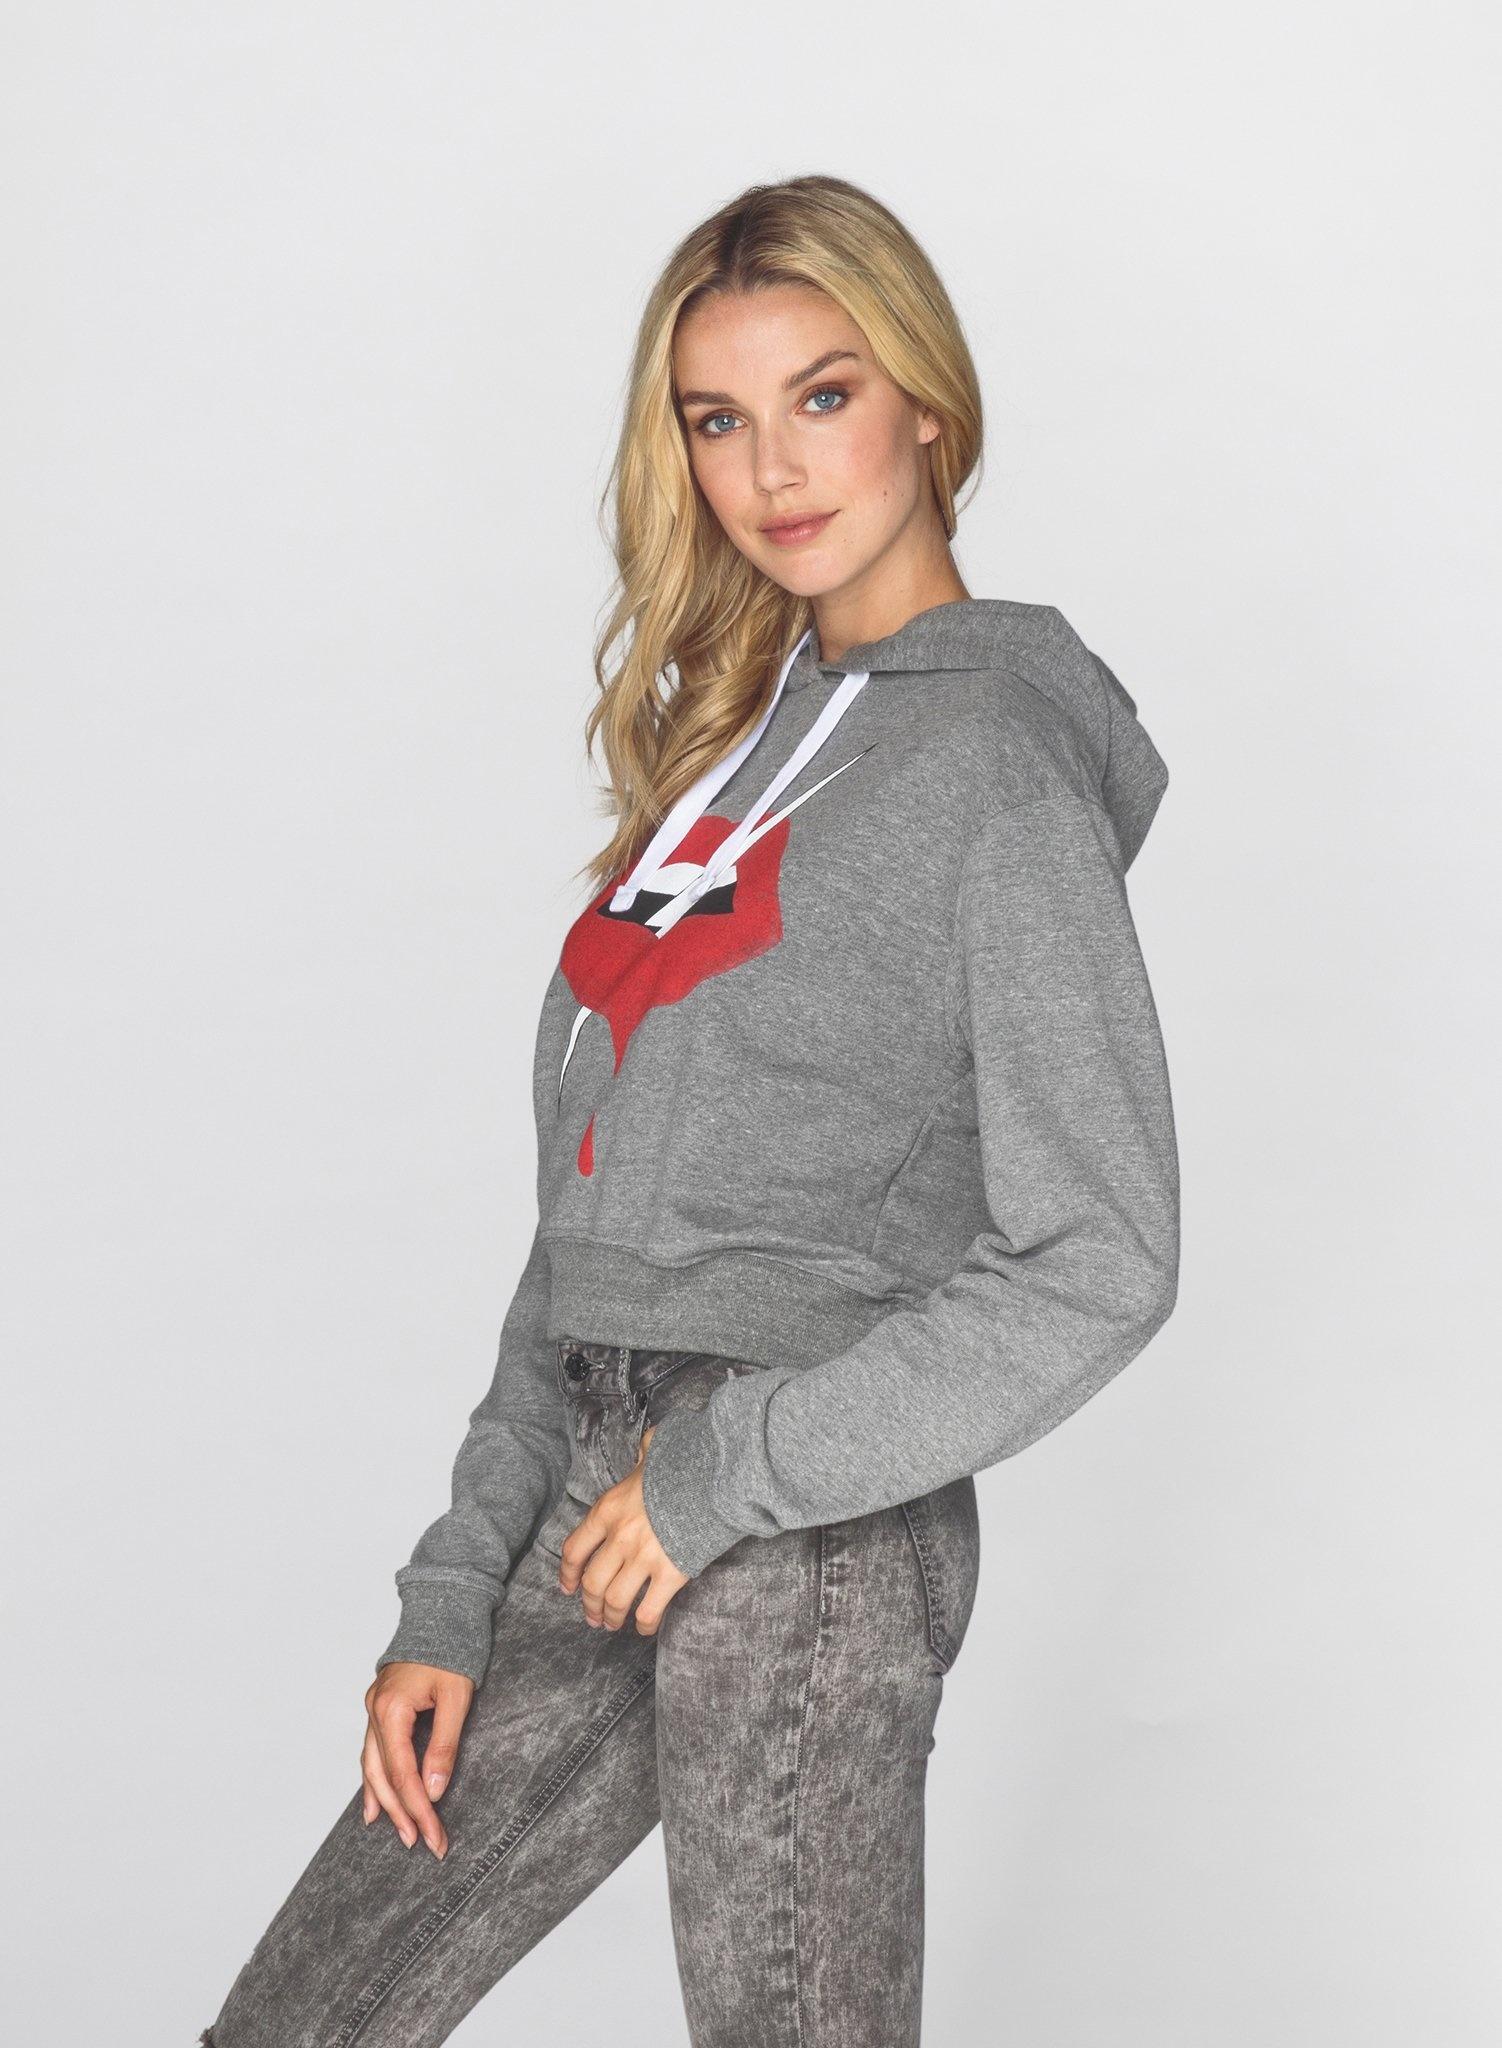 CHRLDR LIPS - Crop Pullover Hoodie